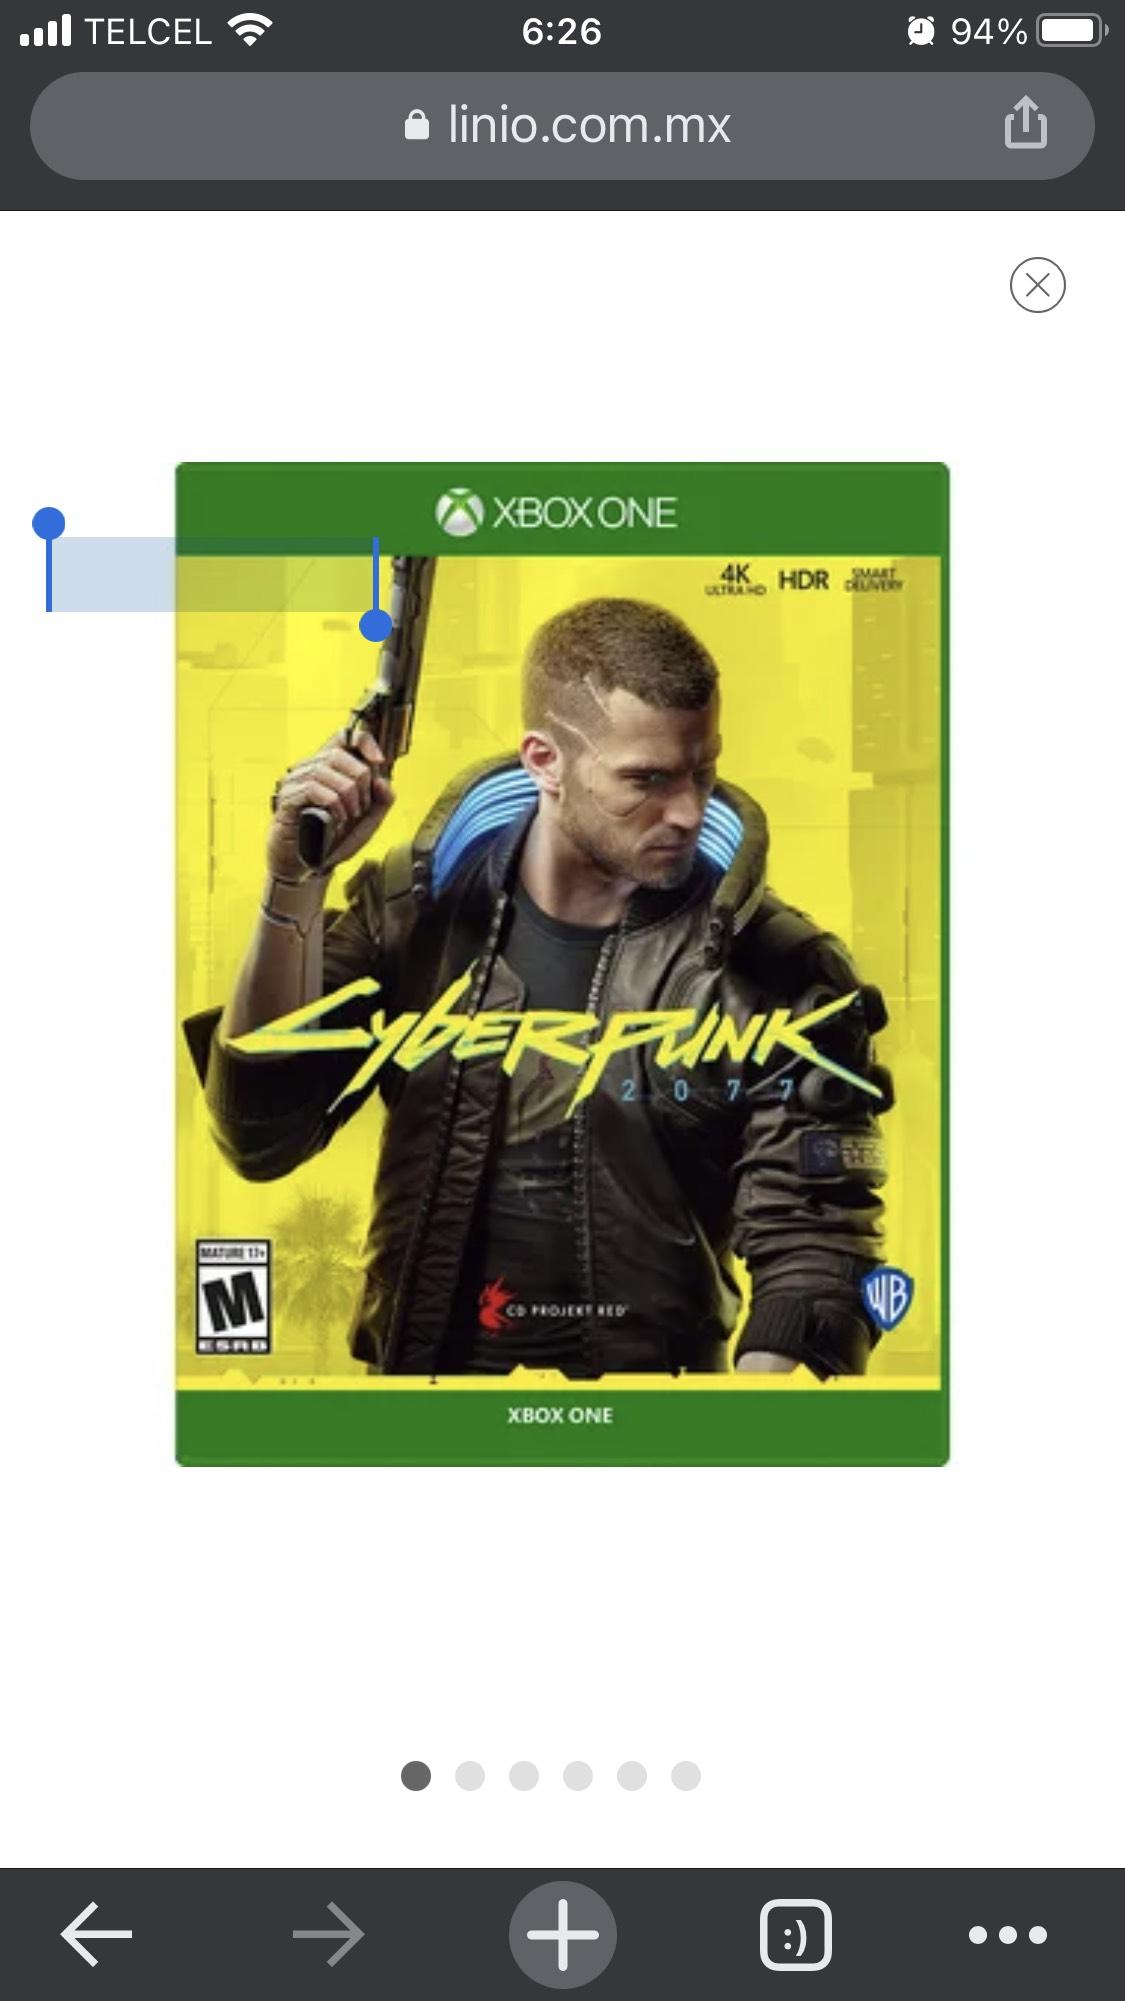 Linio: Cyberpunk 2077 para Xbox pagando con paypal.